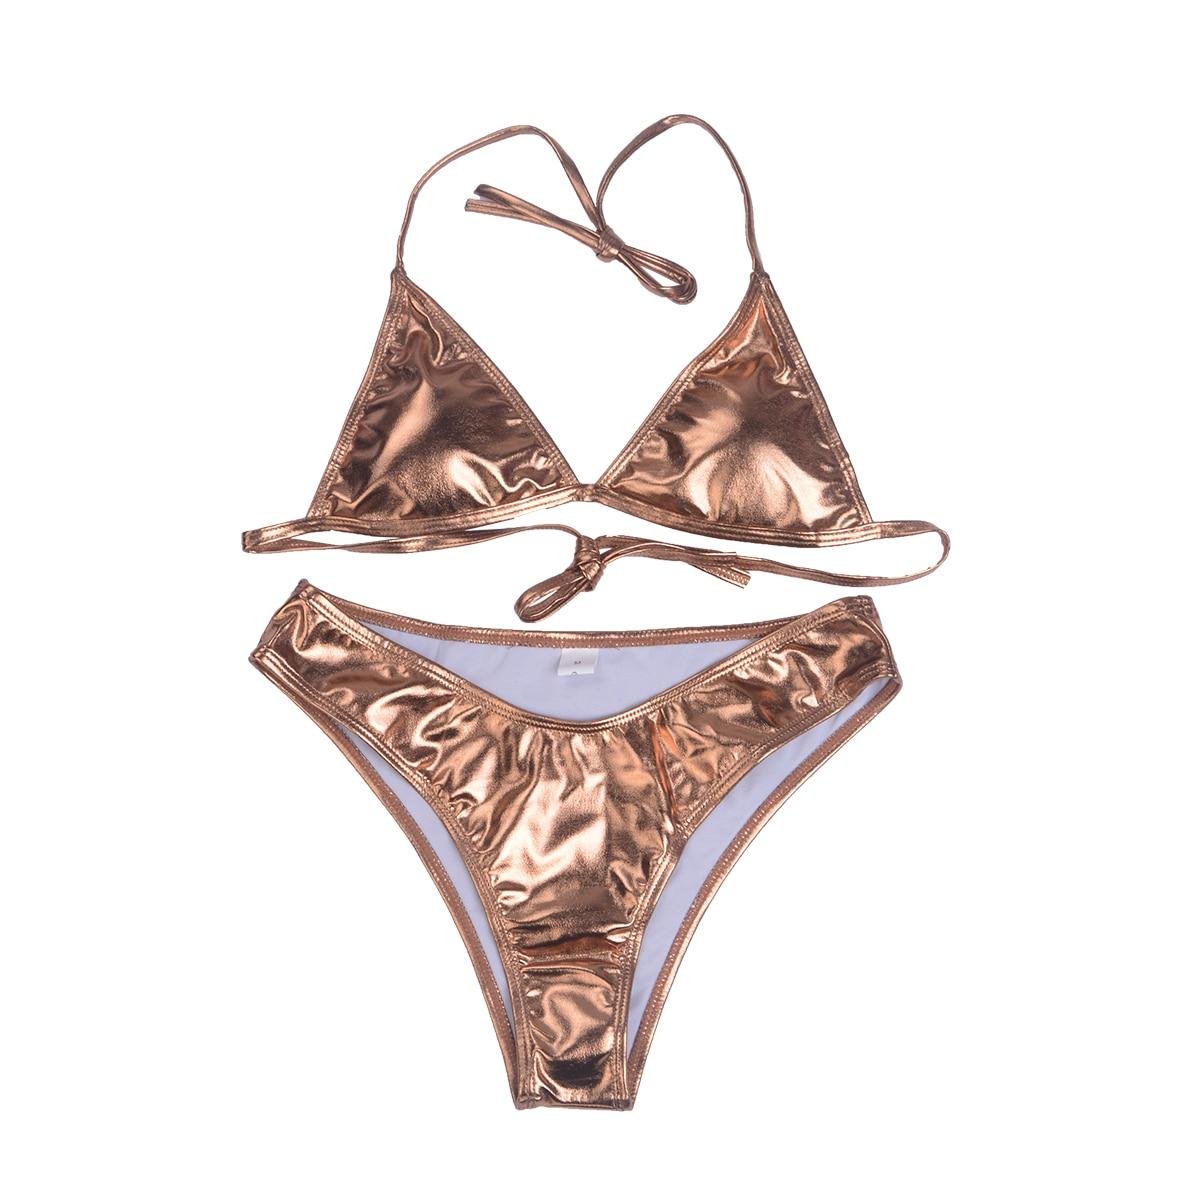 Hot Women Bikini Set Sexy Pure Swimwear Solid Shiny 2Pcs Padded Bra Bandage Triangle Swimsuit Push up Bathing Suit Lady Tankini in Bikinis Set from Sports Entertainment